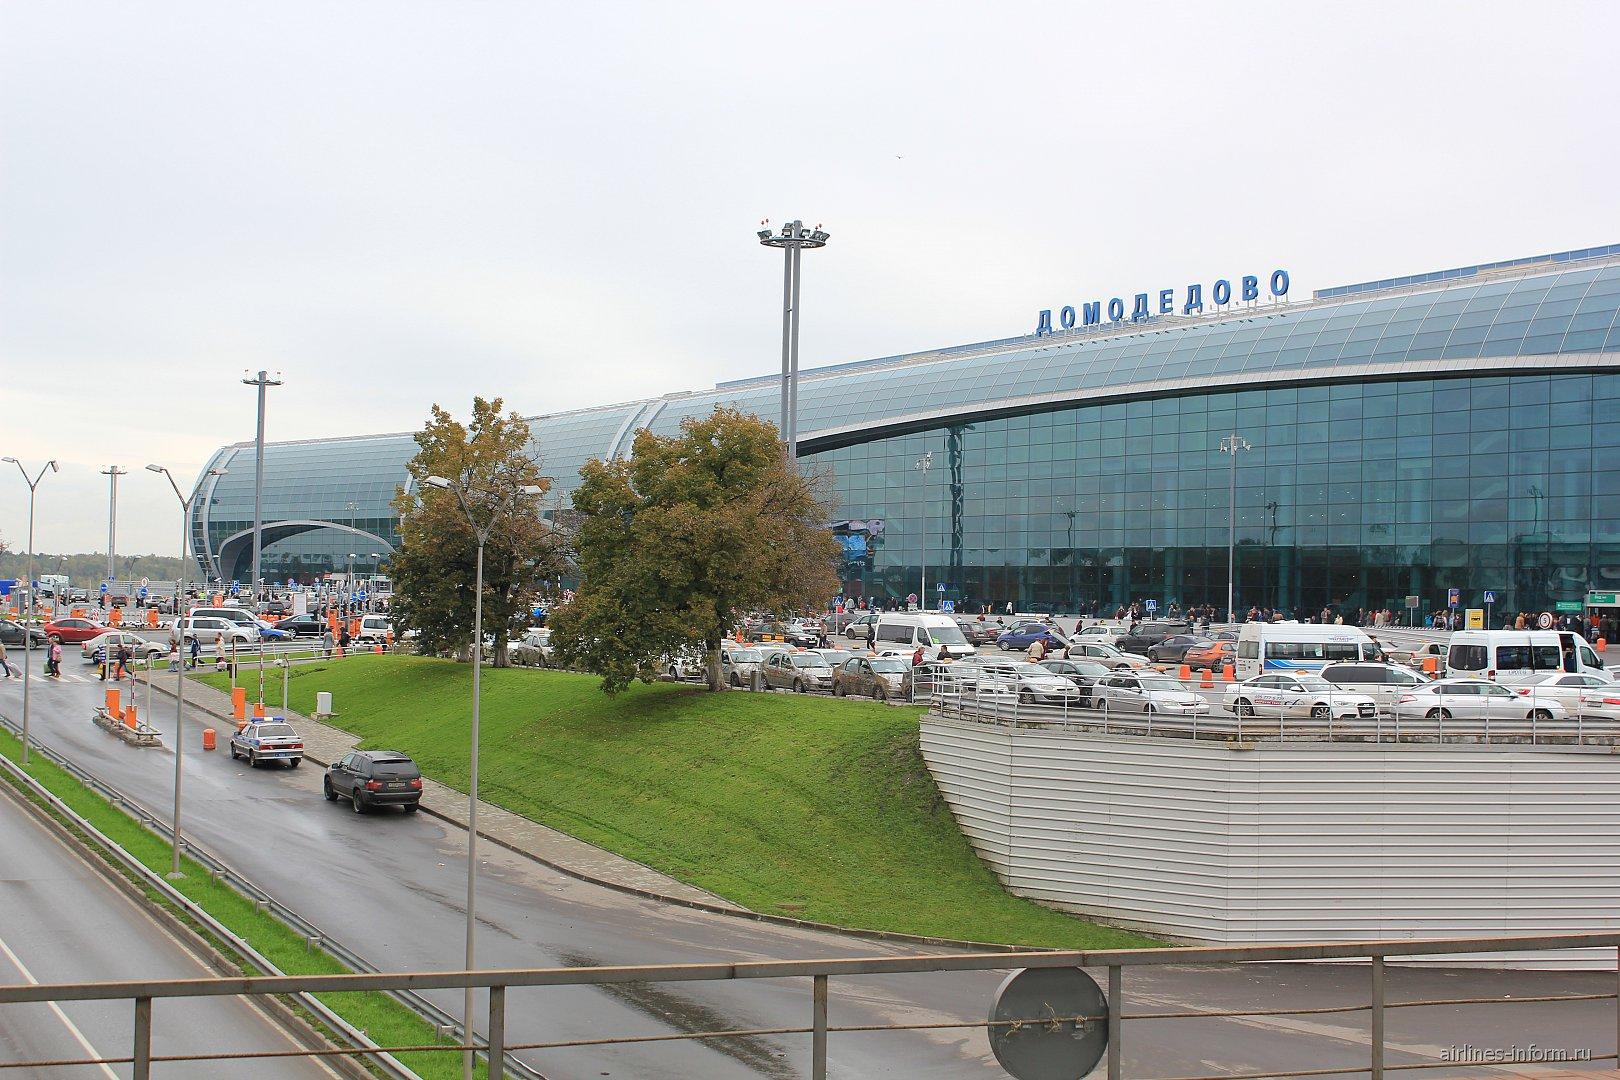 Пассажирский терминал аэропорта Москва Домодедово